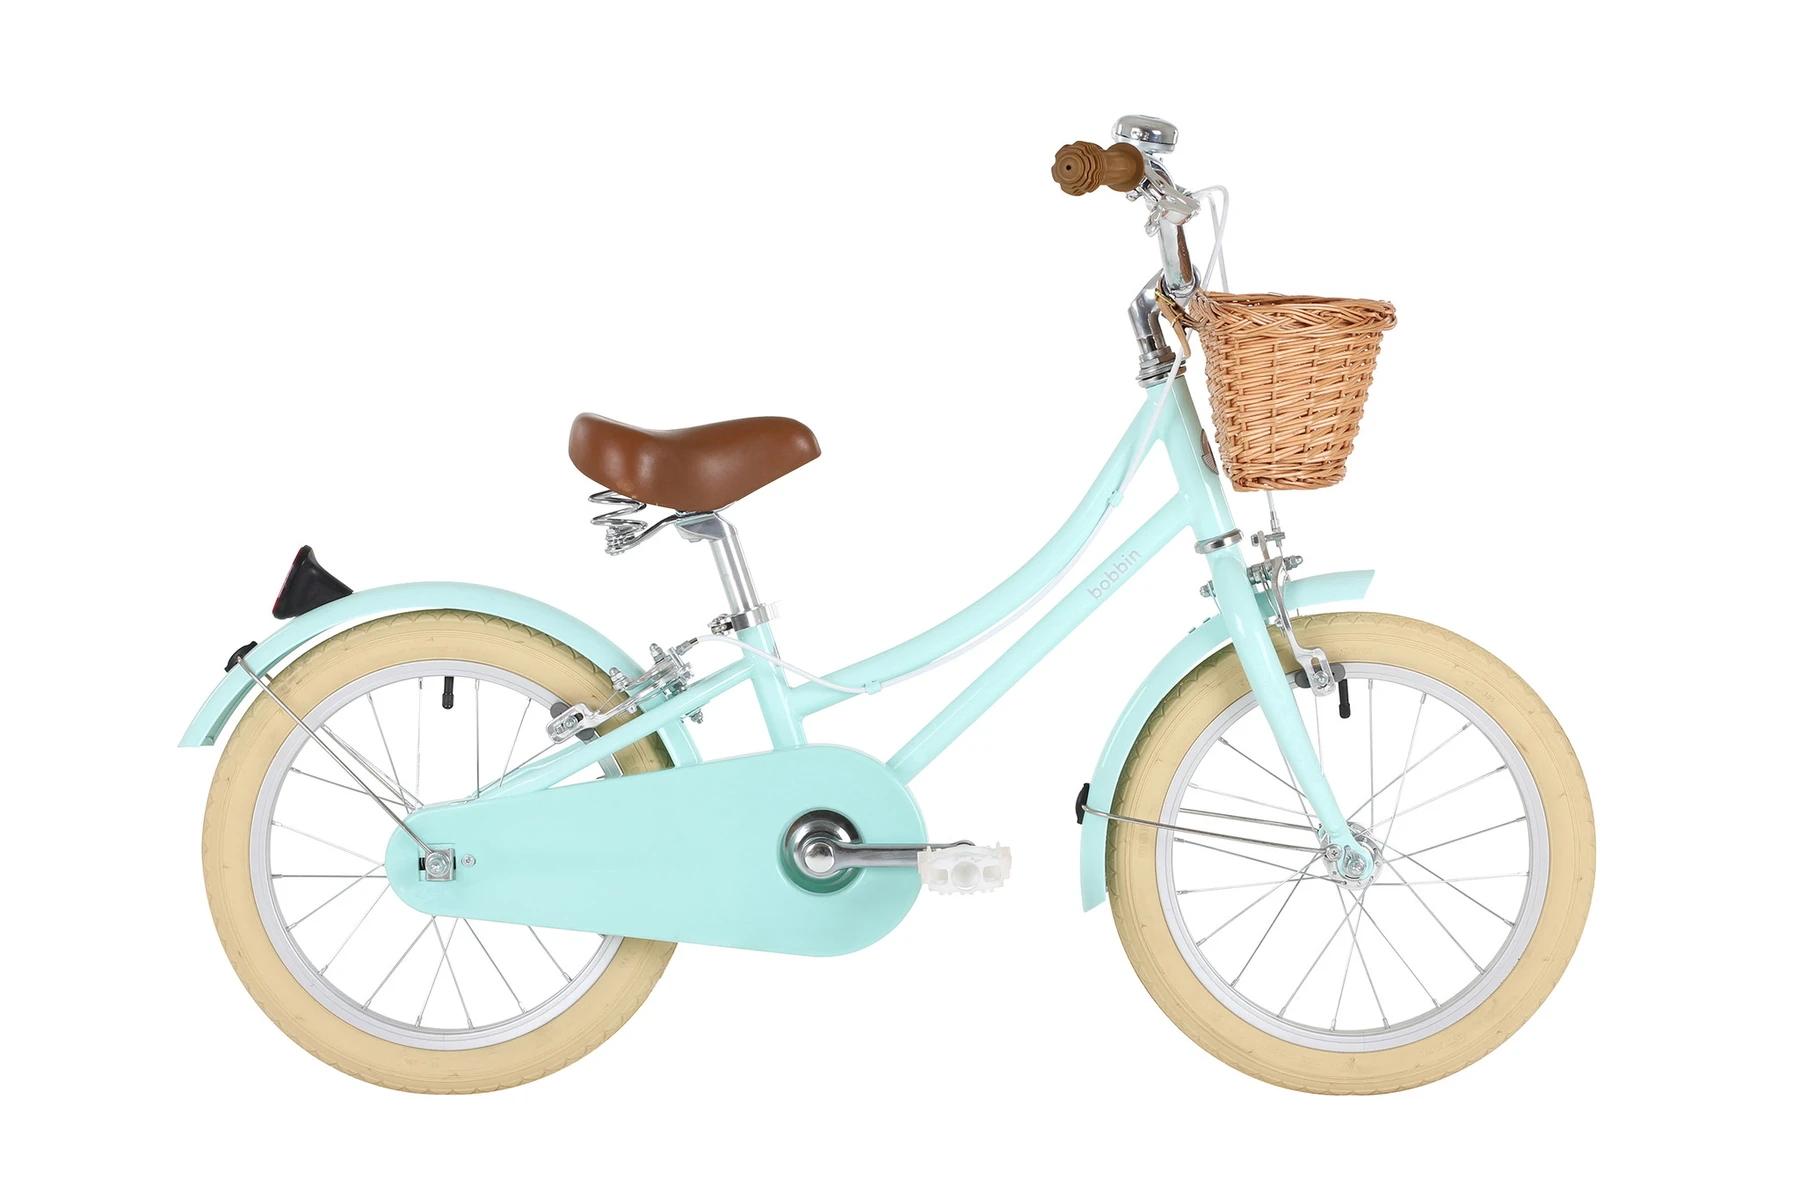 Bicicleta Criança Bobbin Gingersnap